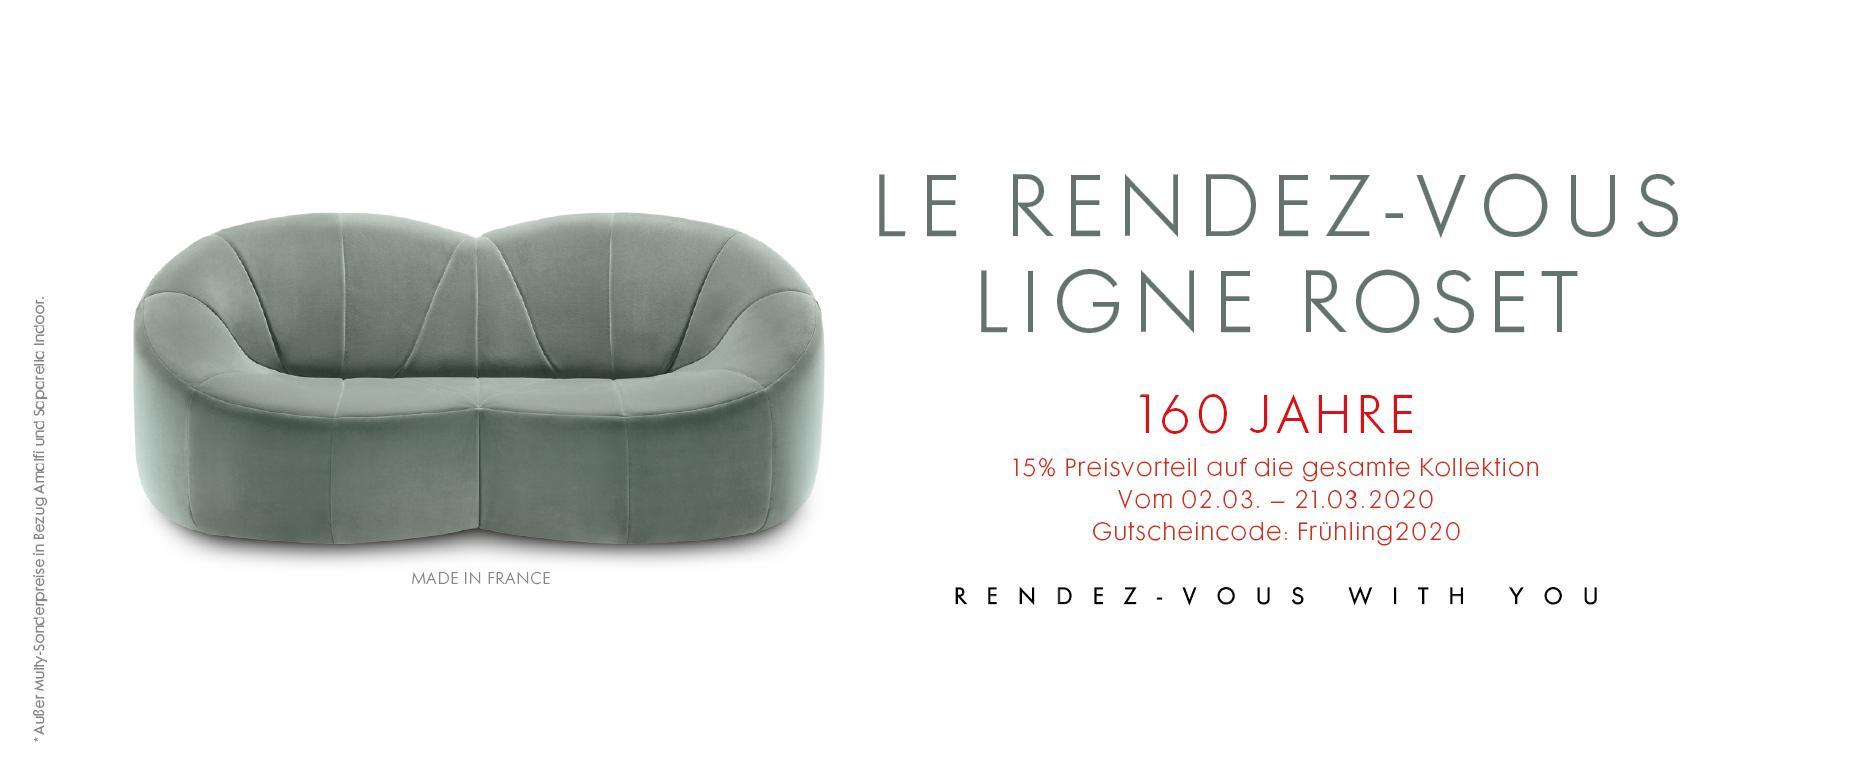 THE LIGNE ROSET RENDEZ-VOUS Ligne Roset